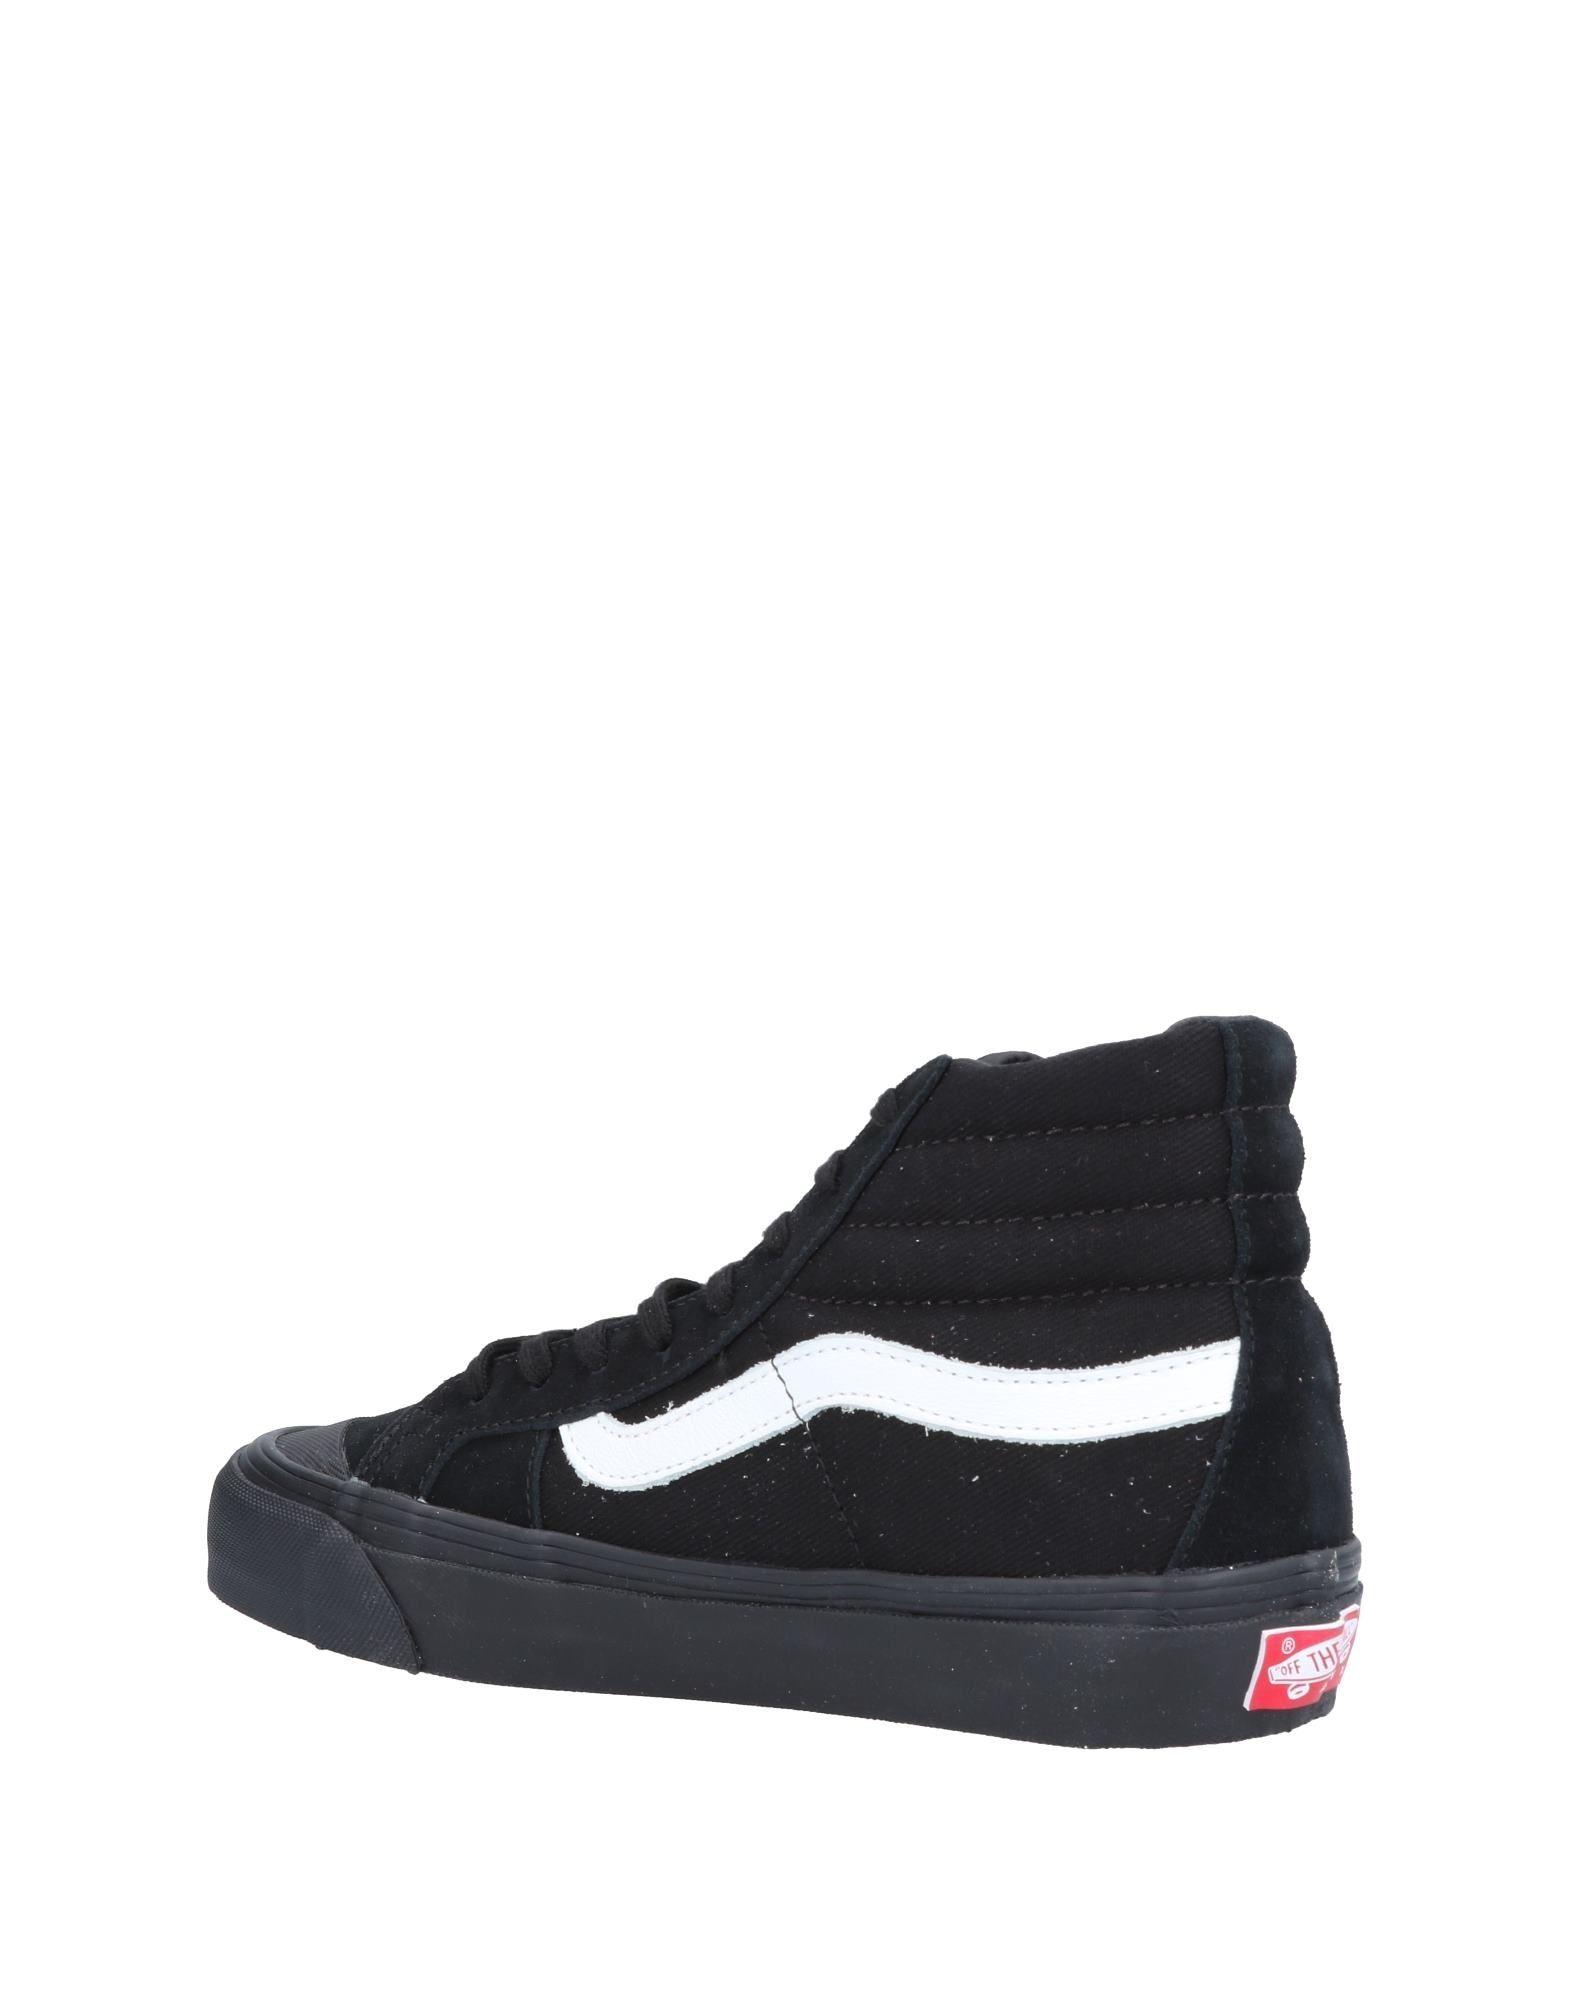 Vans Sneakers Damen Damen Sneakers  11500730JK b5095d